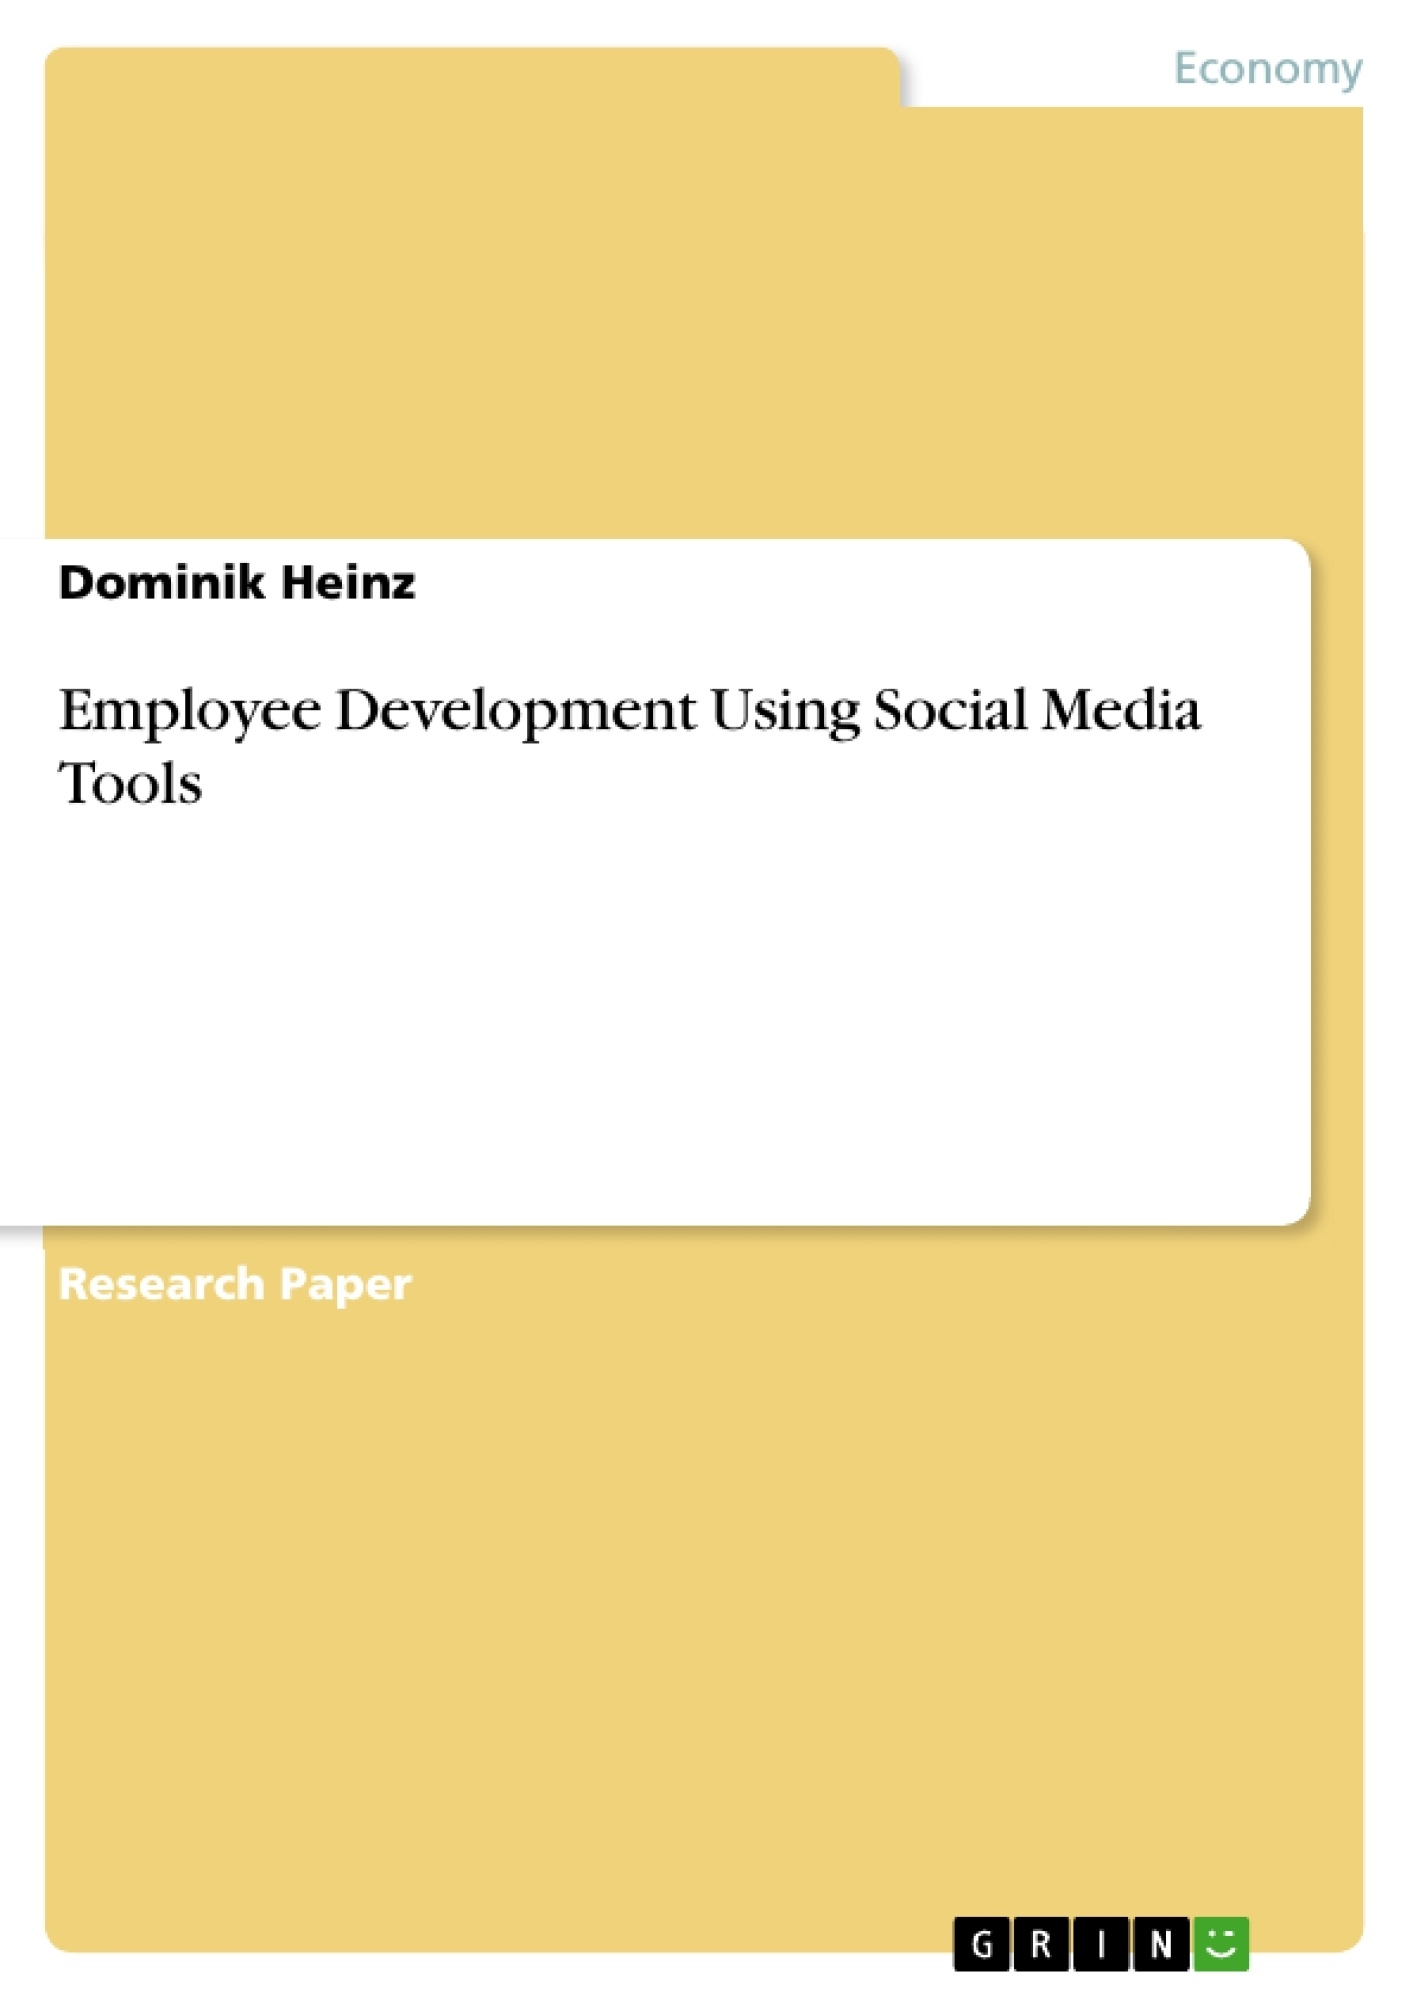 Title: Employee Development Using Social Media Tools